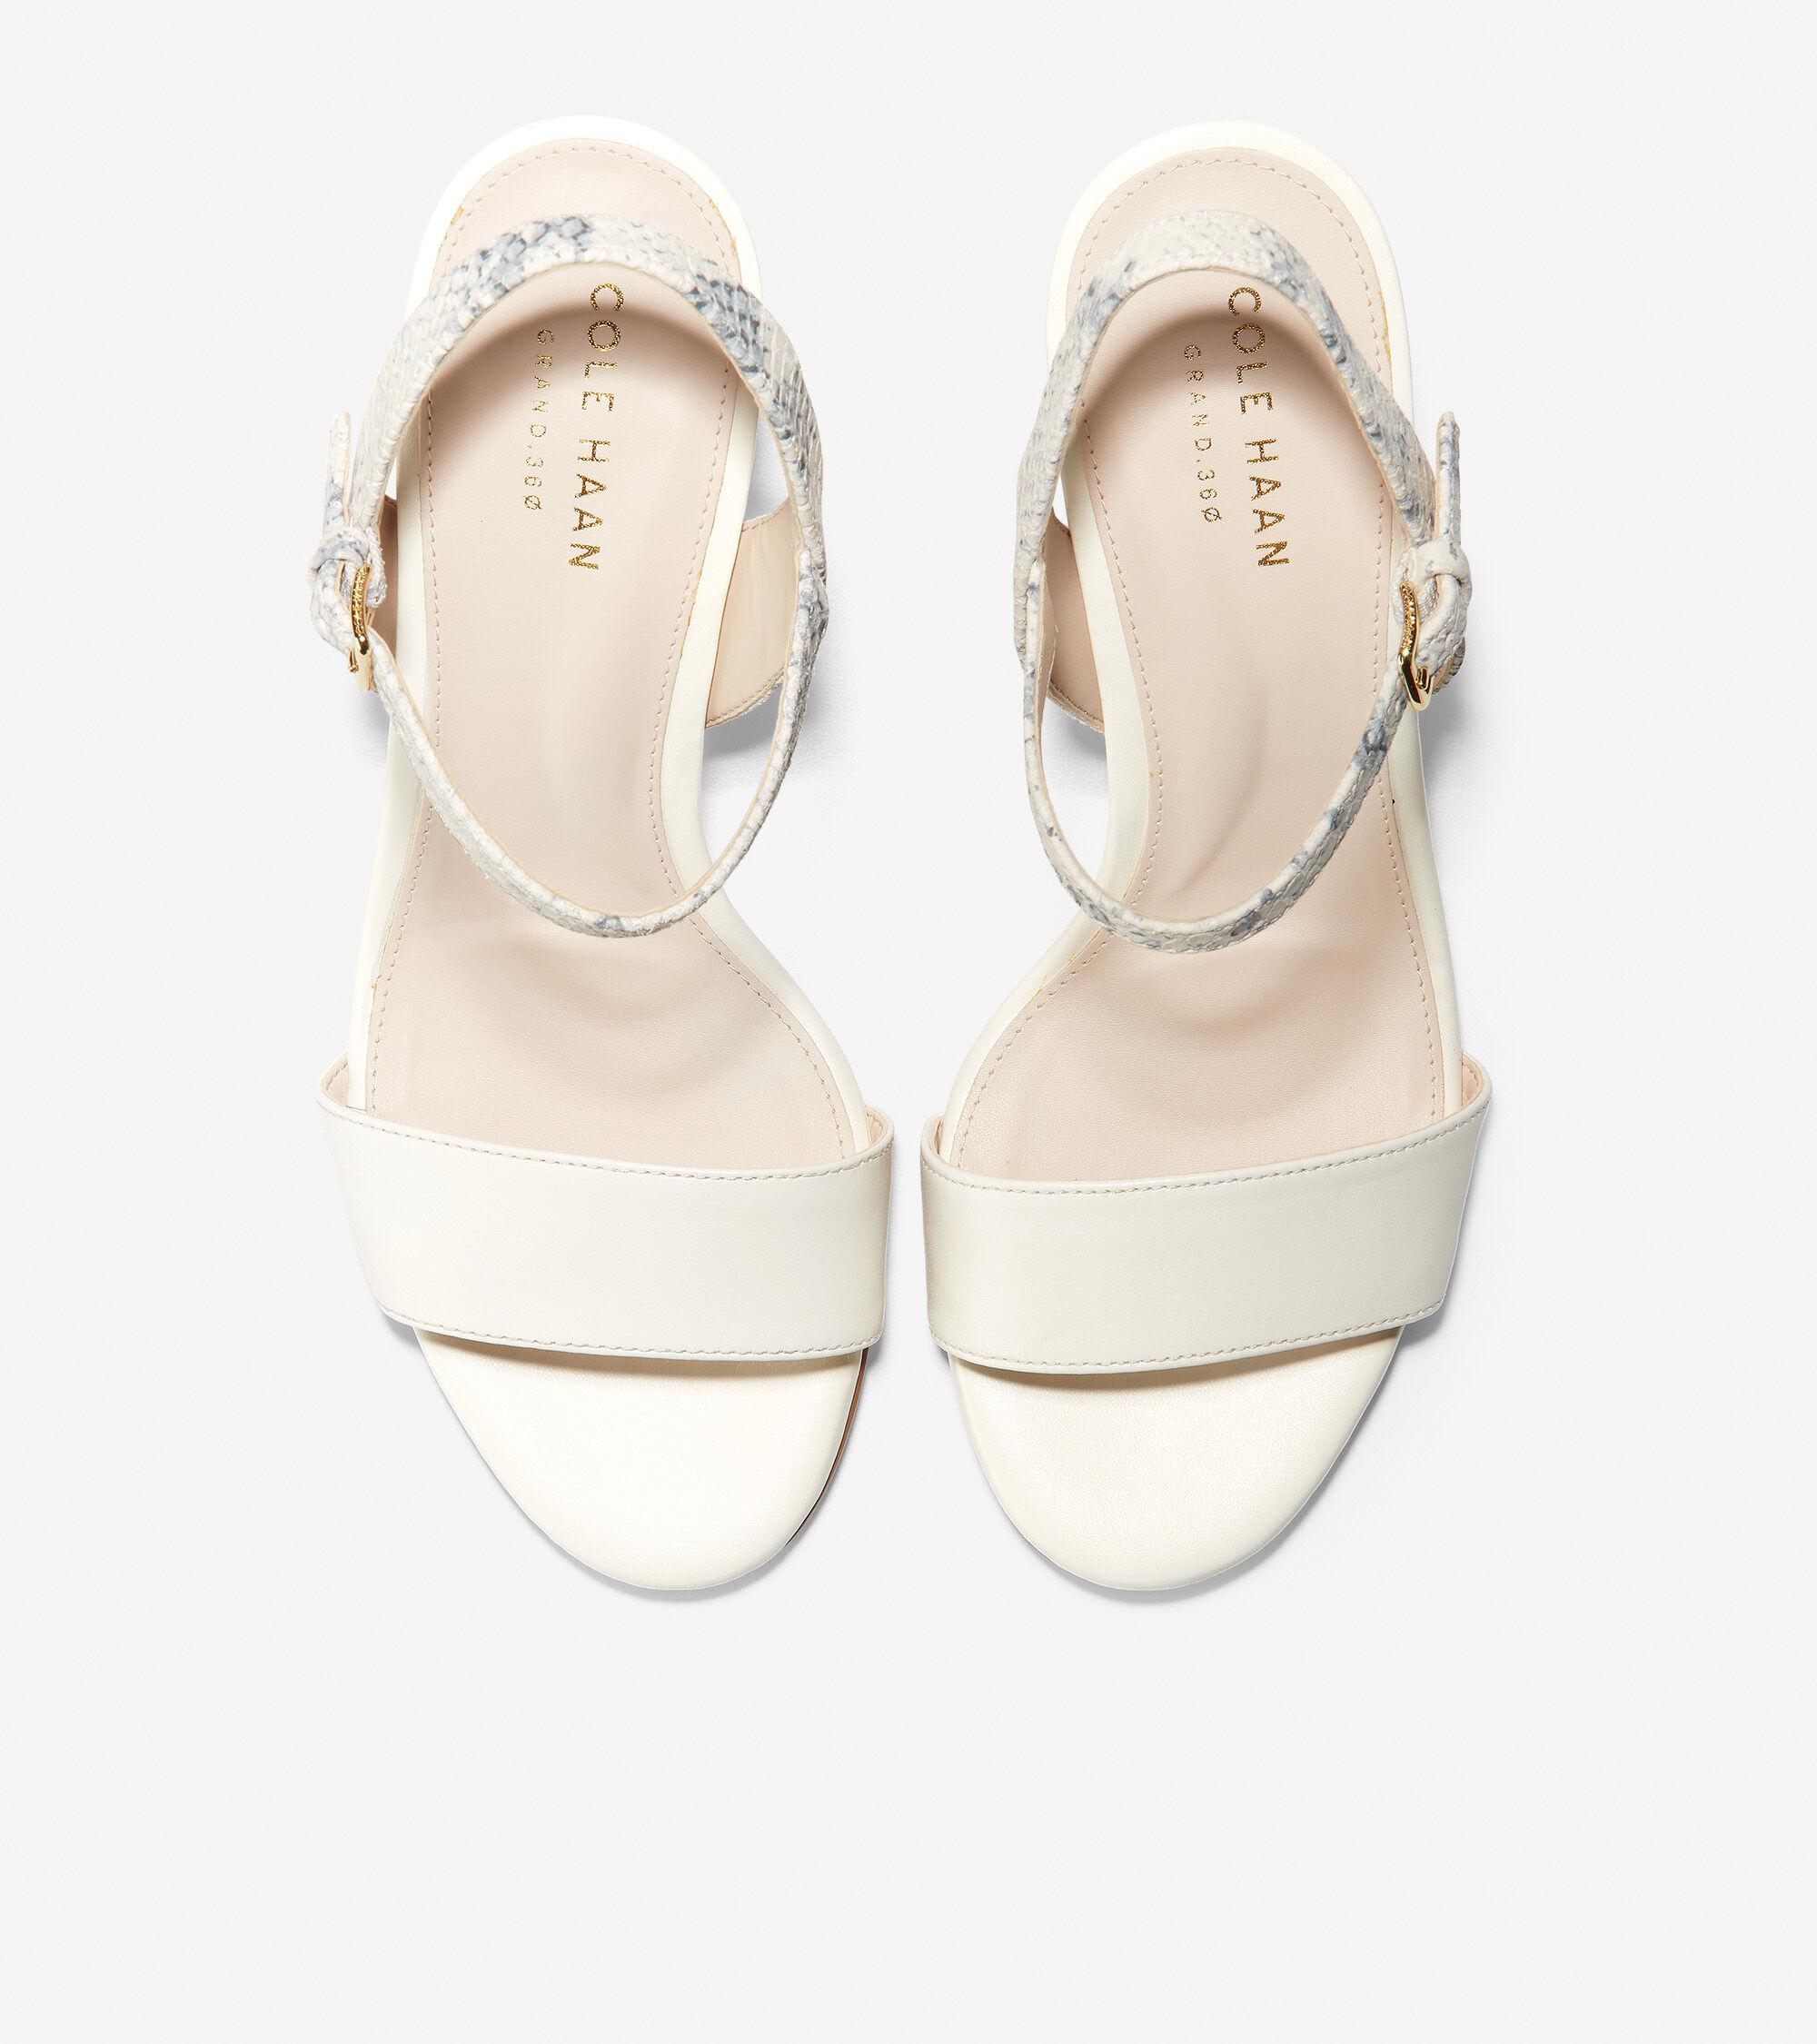 Josie Block Heel Sandal in Ivory Roccia